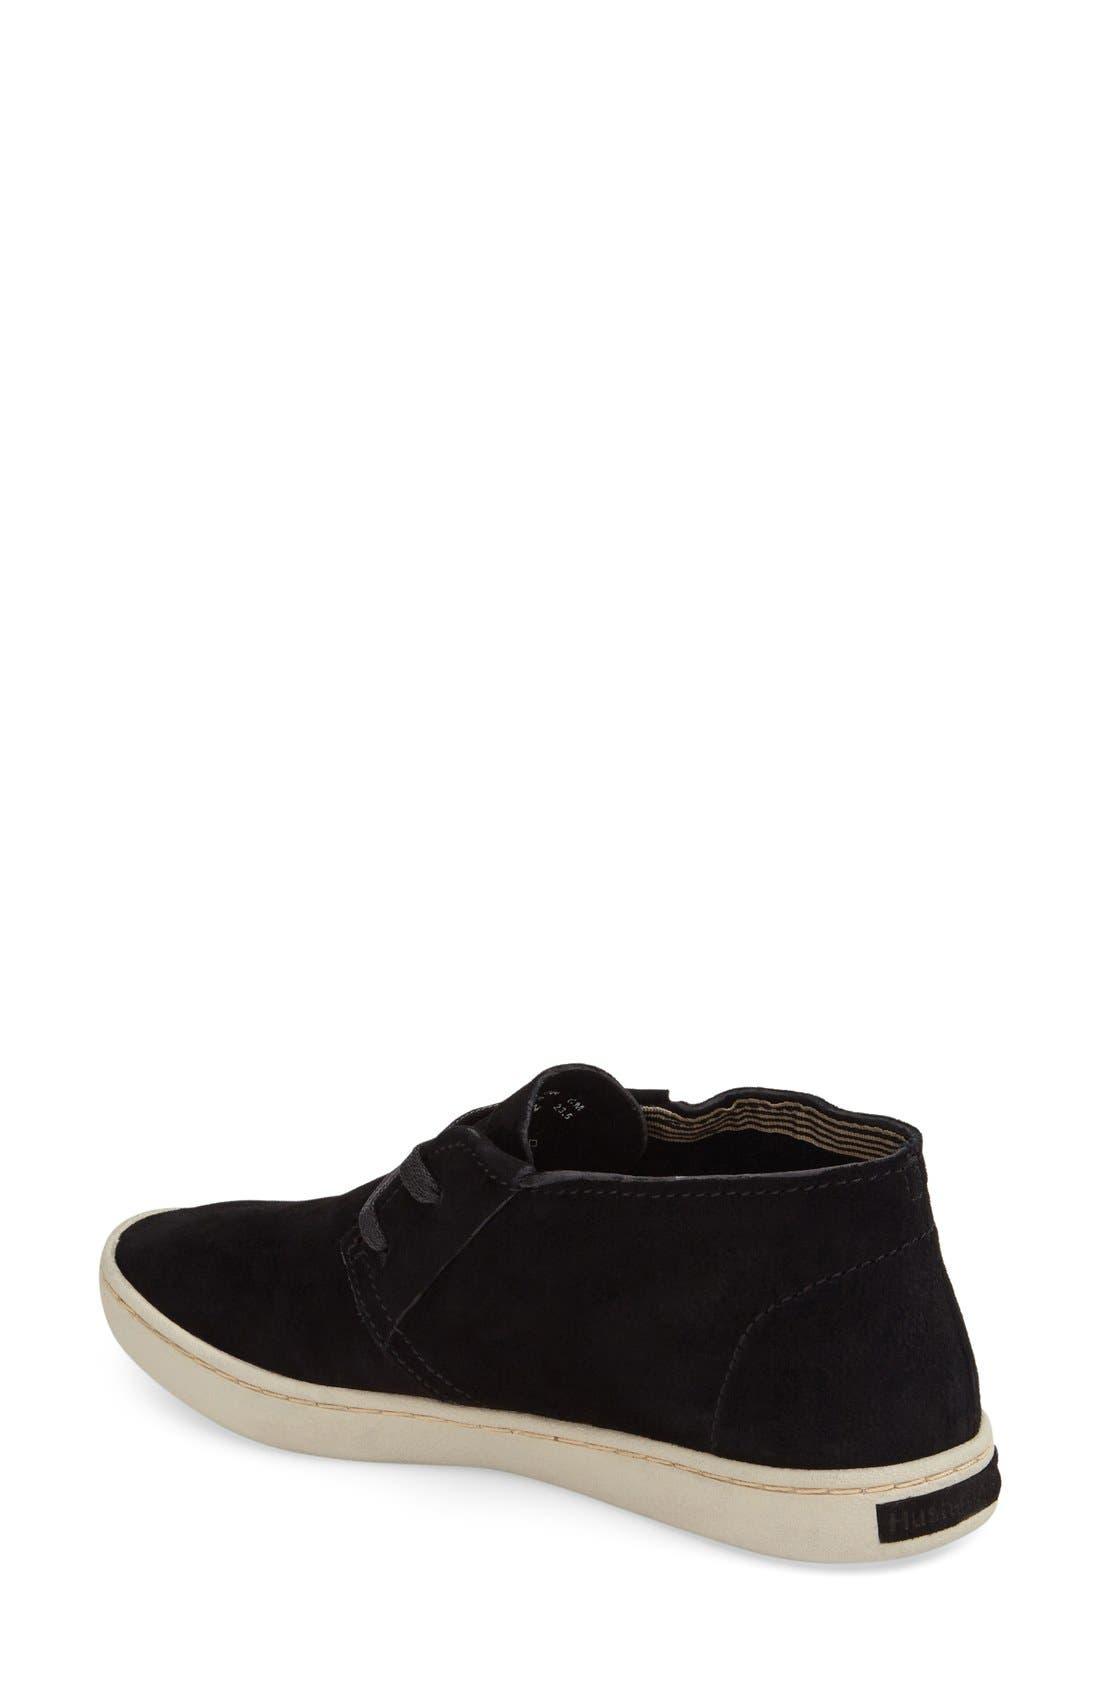 'Cille Gwen' Sneaker,                             Alternate thumbnail 23, color,